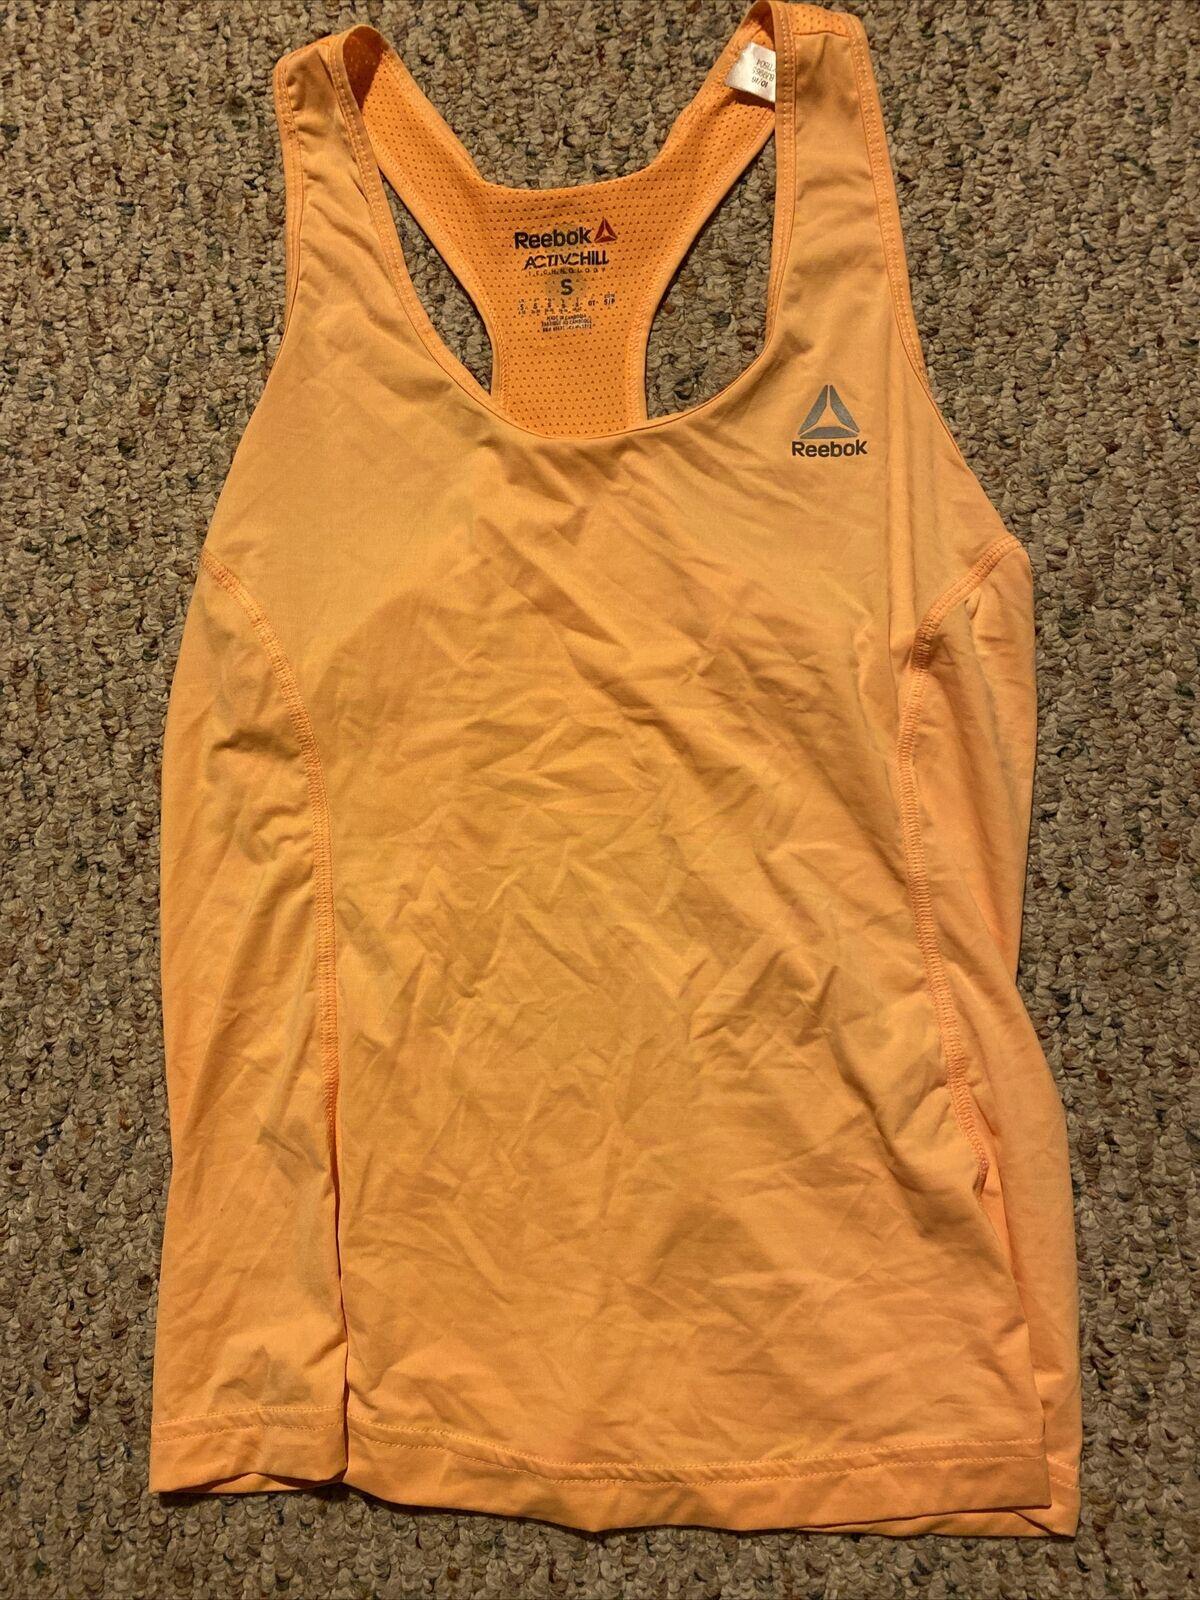 Reebok Active Chill Womens S Orange Halter Top Shirt Running Athletic Keep Cool